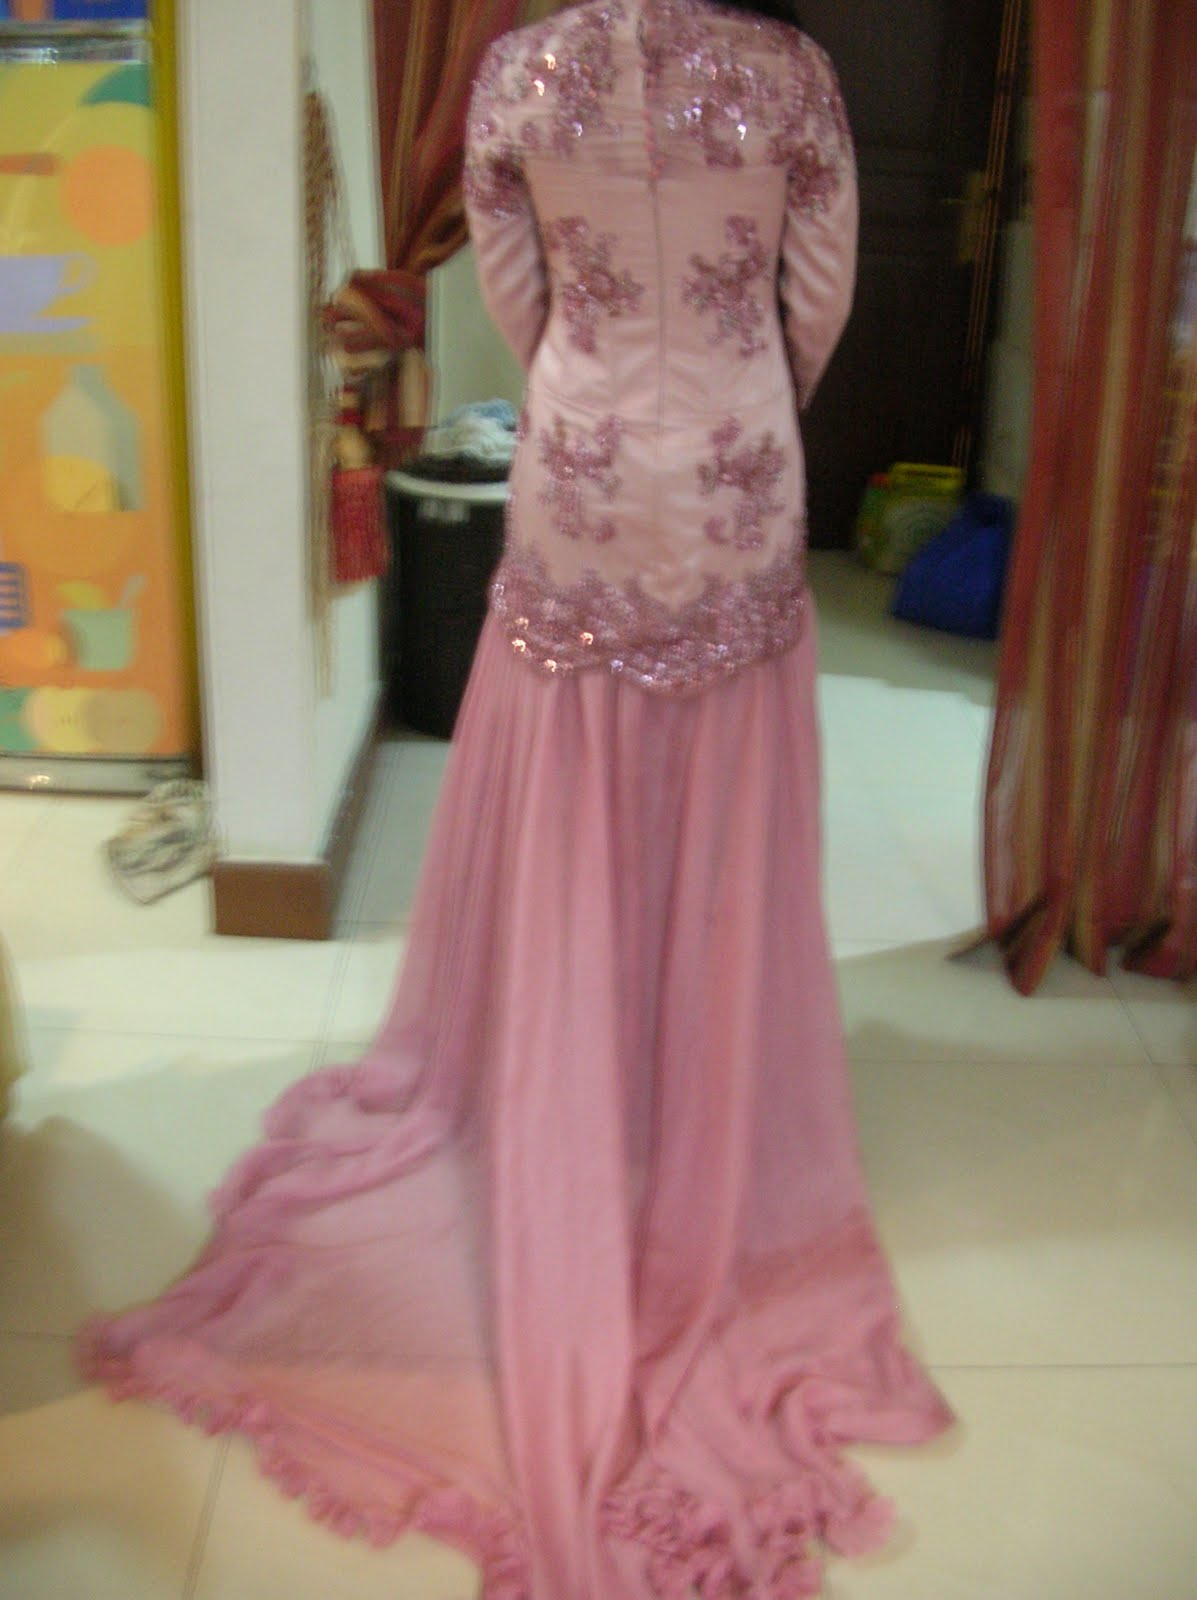 Budget Untuk Gaun Seperti Ini Termasuk Bahan Dan Jilbabnya